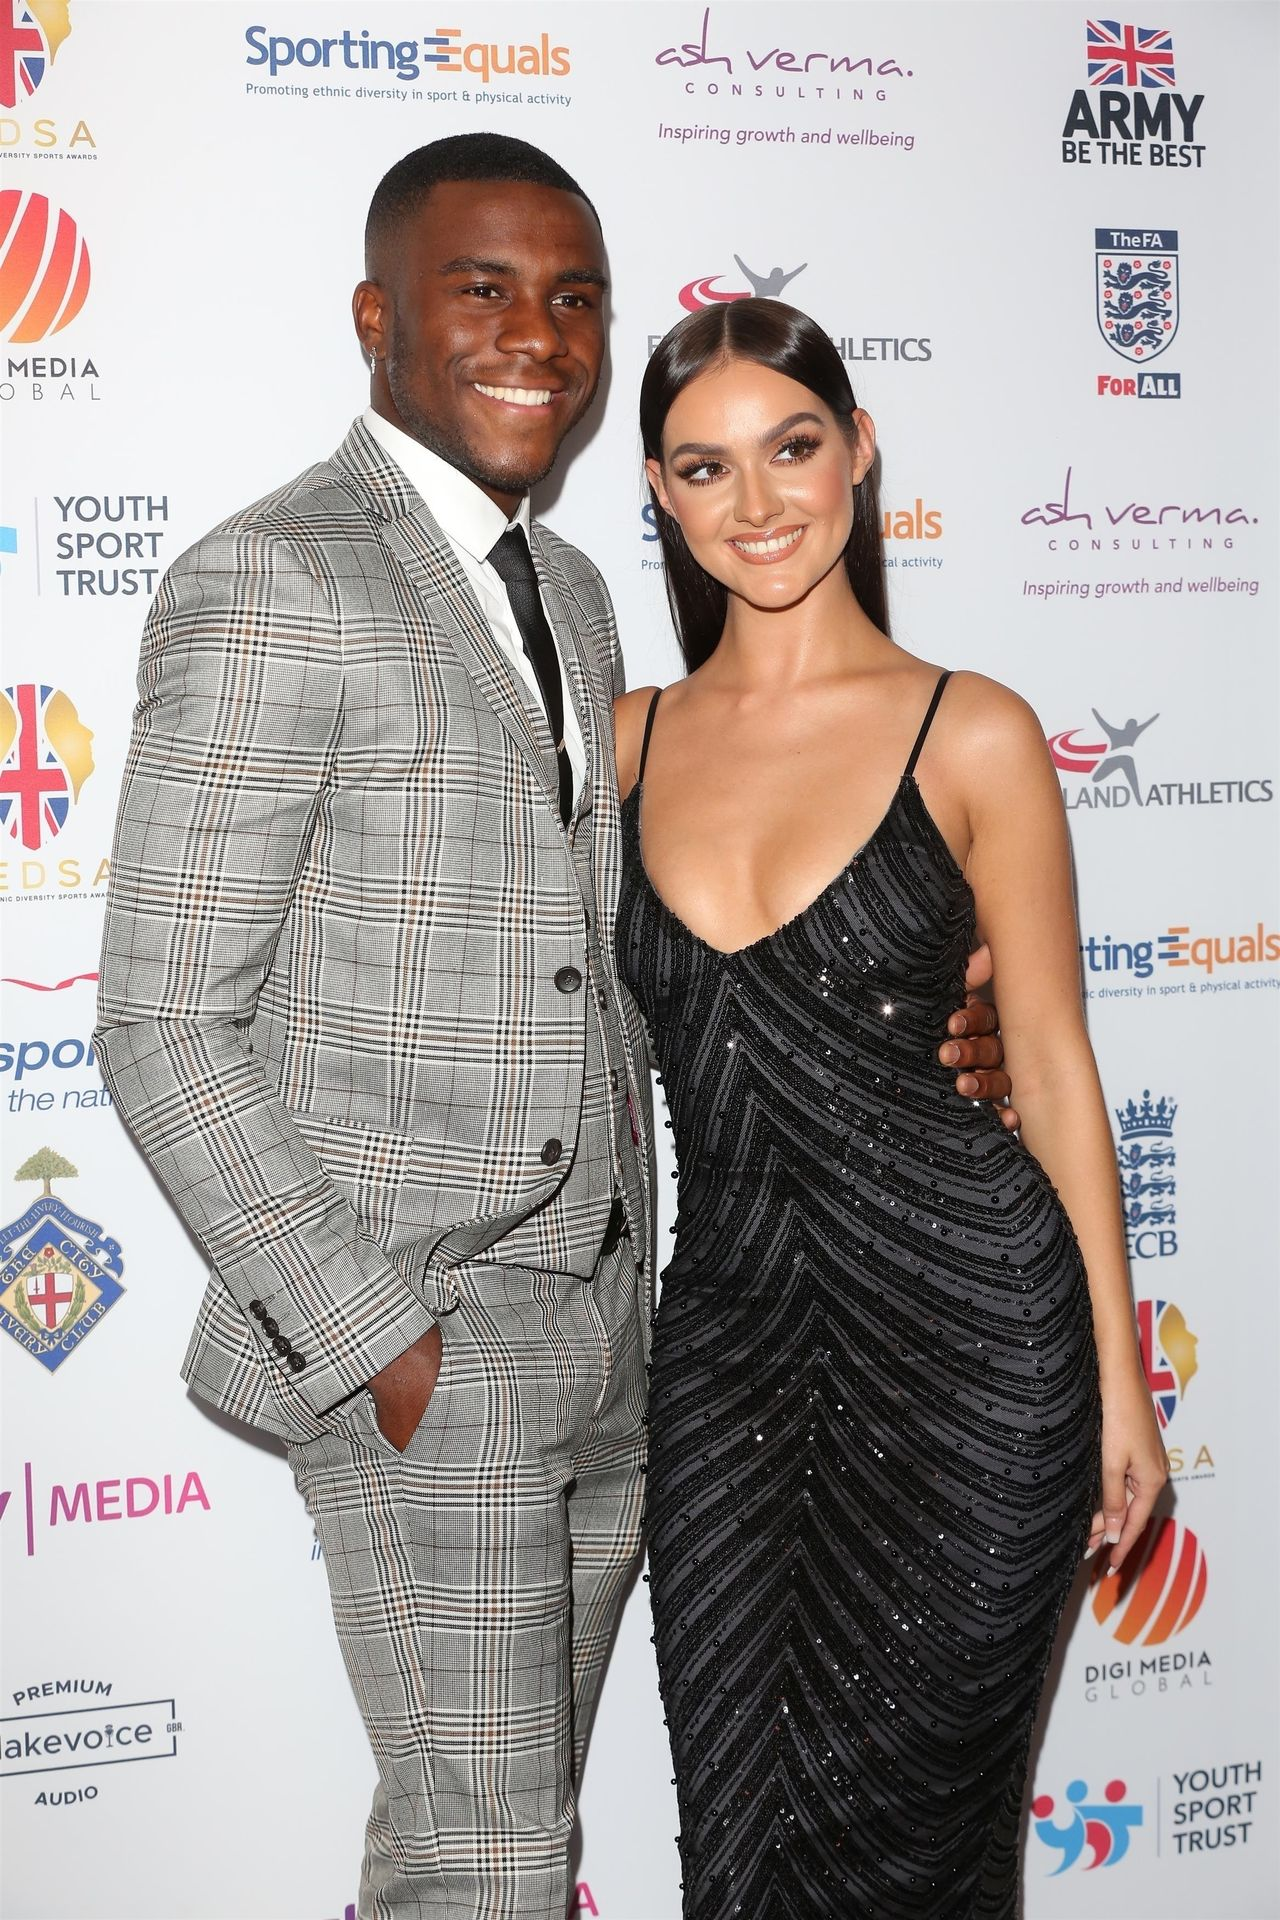 Siannise Fudge & Luke Trotman Are Seen At British Ethnic Diversity Sports Awards 0051